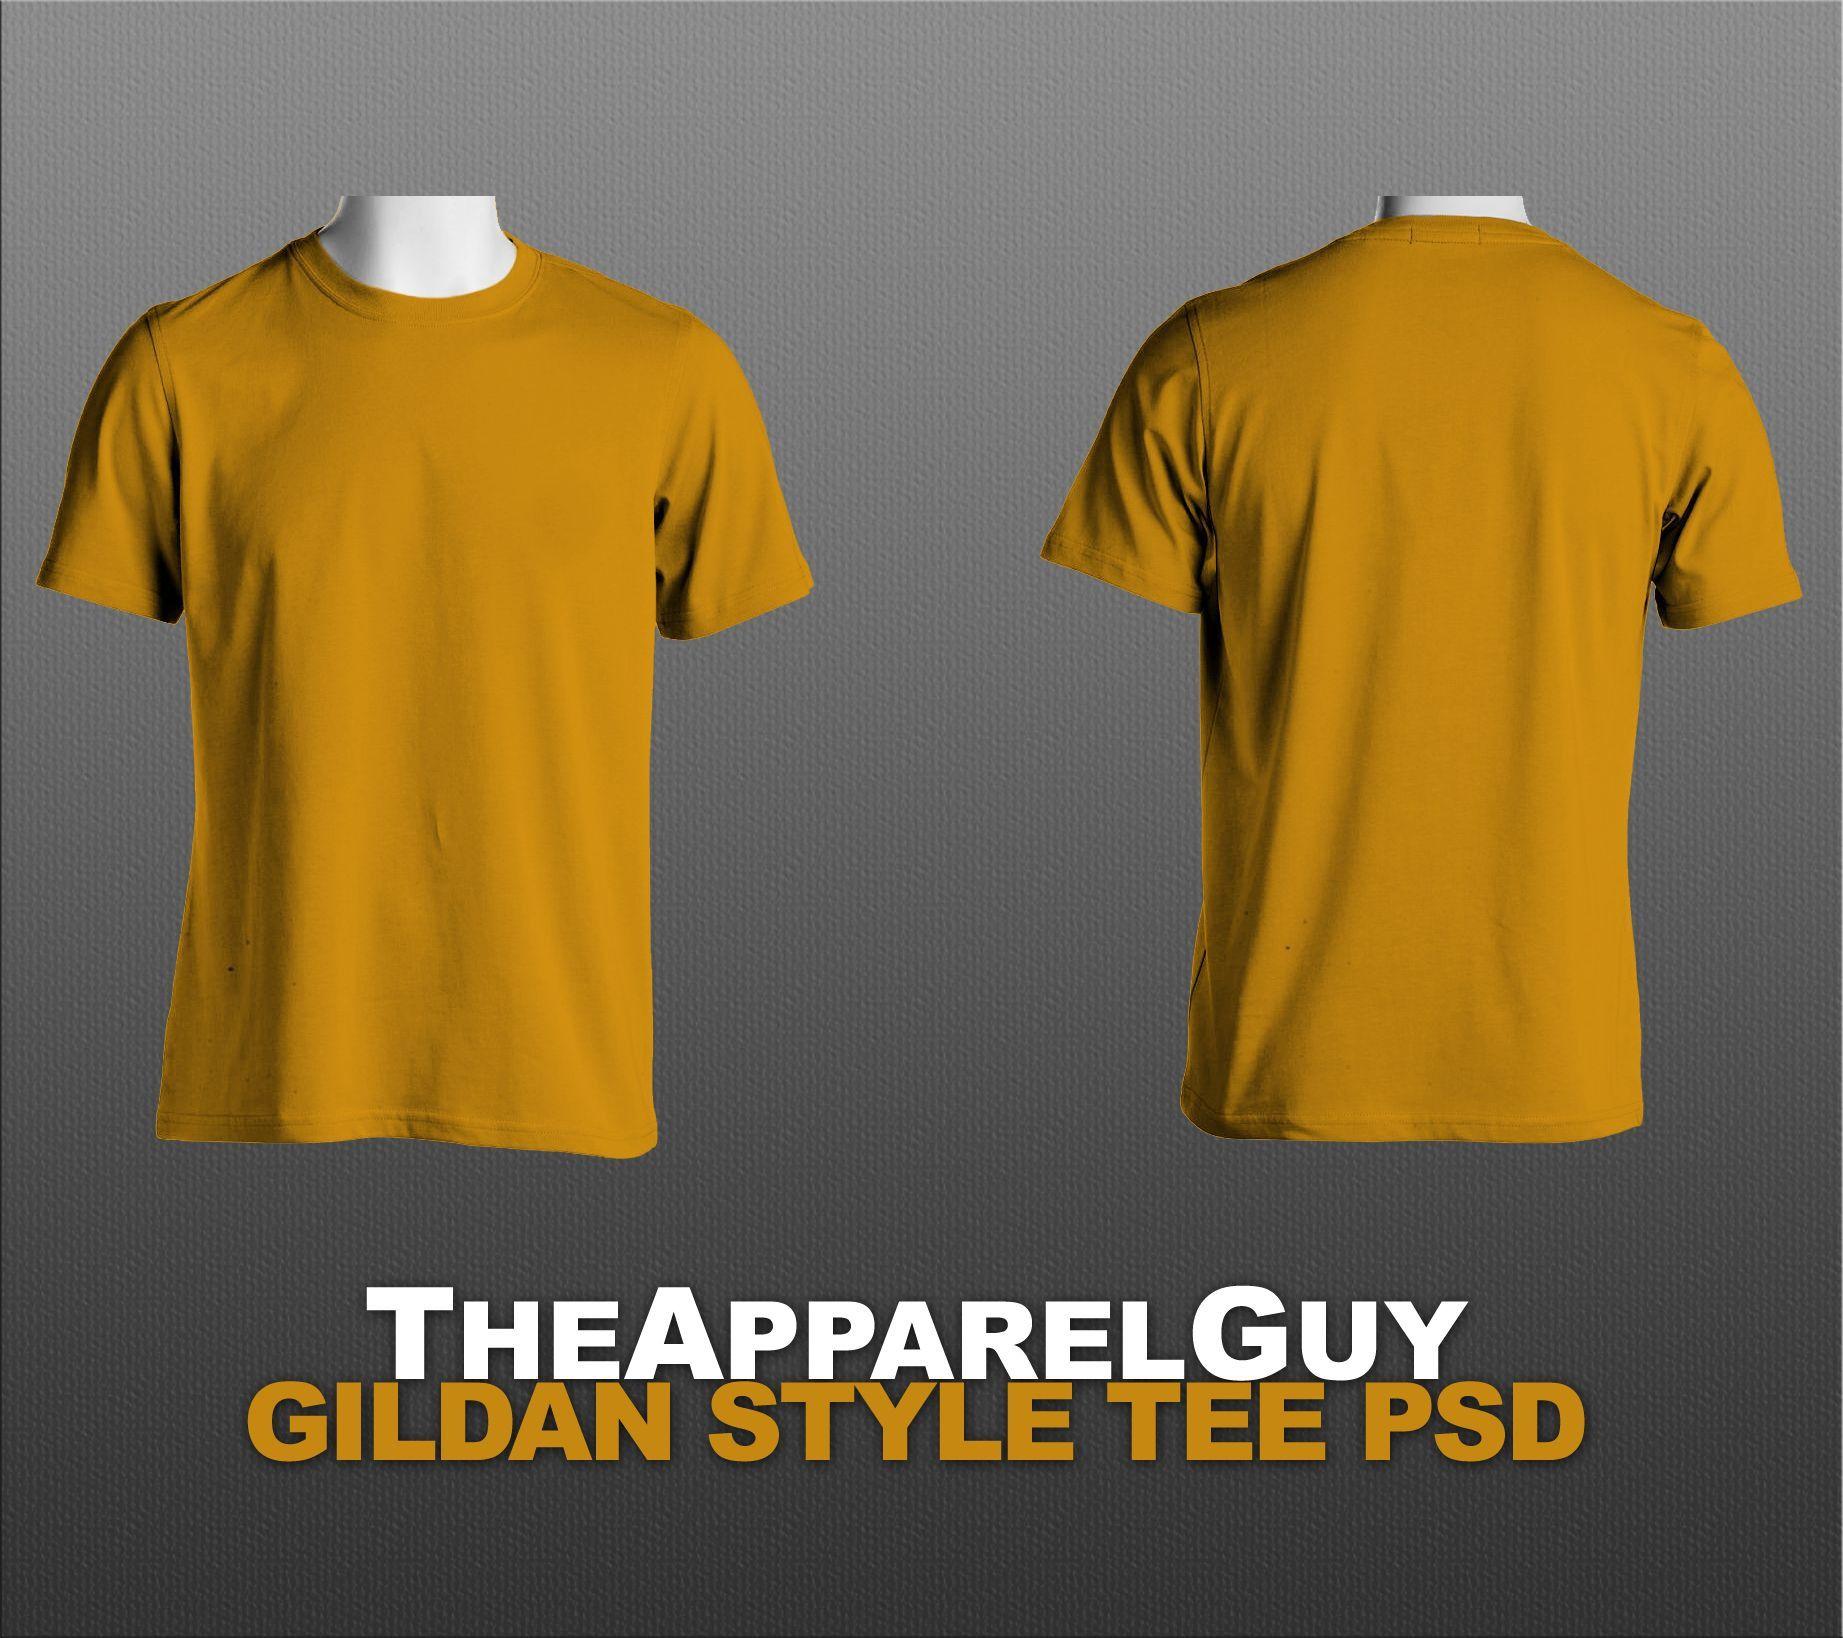 002 Stirring T Shirt Template Psd Highest Clarity  Design Mockup Free White CollarFull